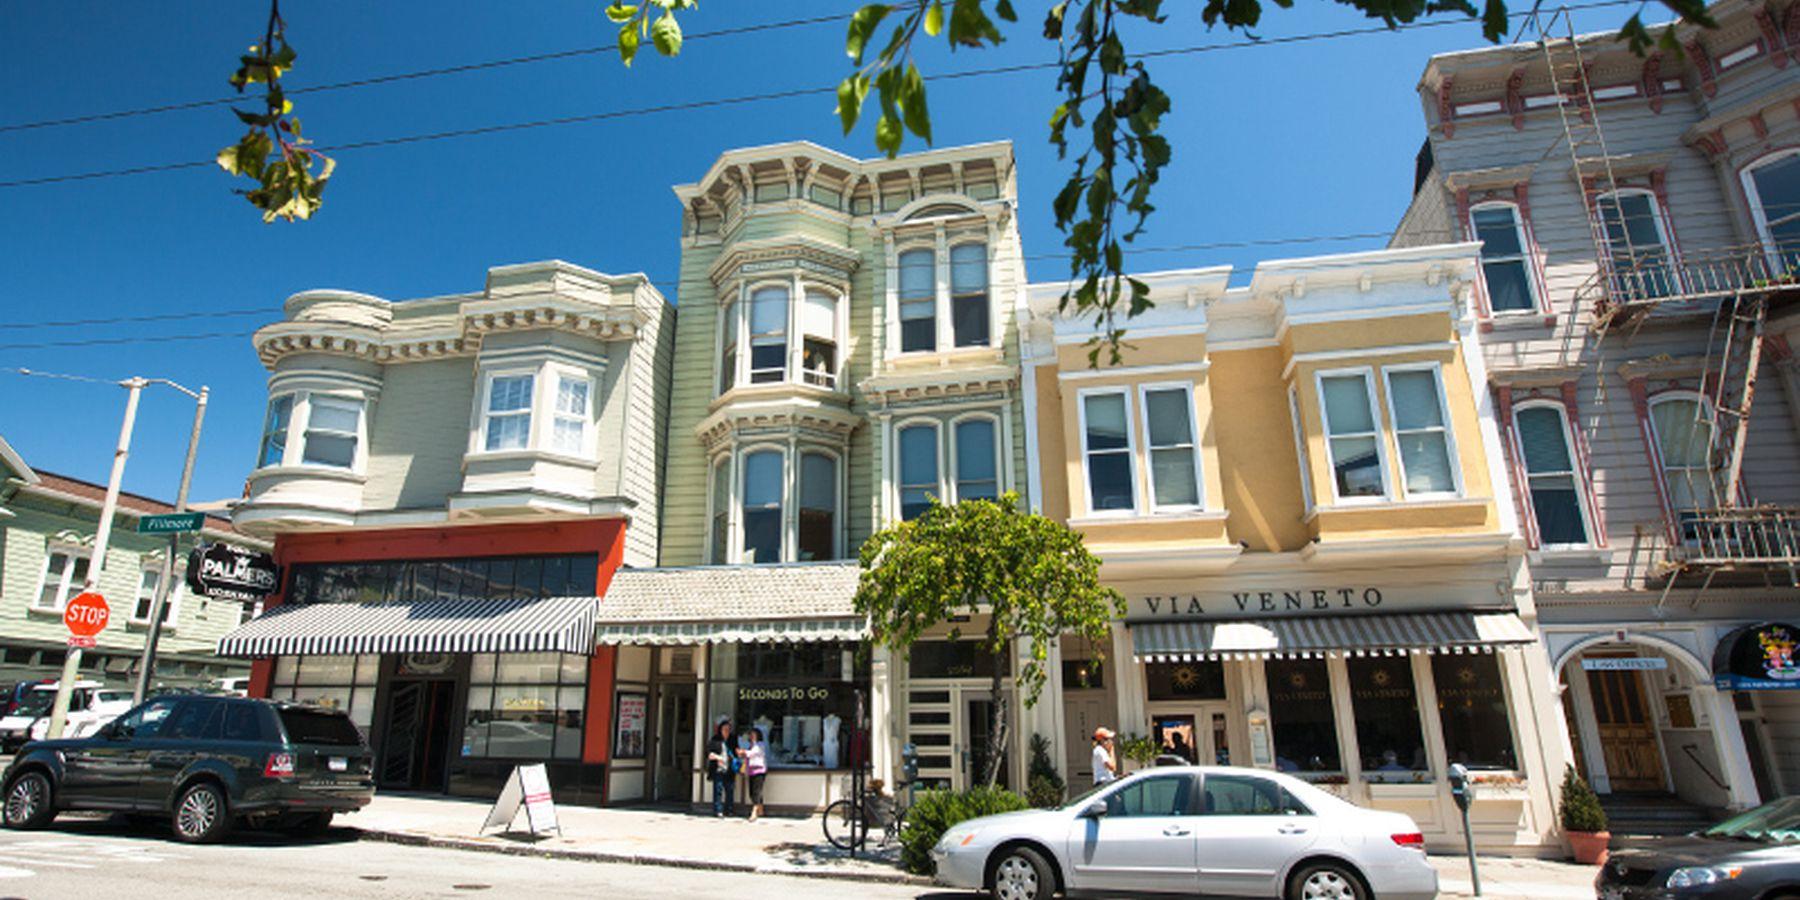 Lower Pac Heights - San Francisco - California - Amerika - Doets Reizen